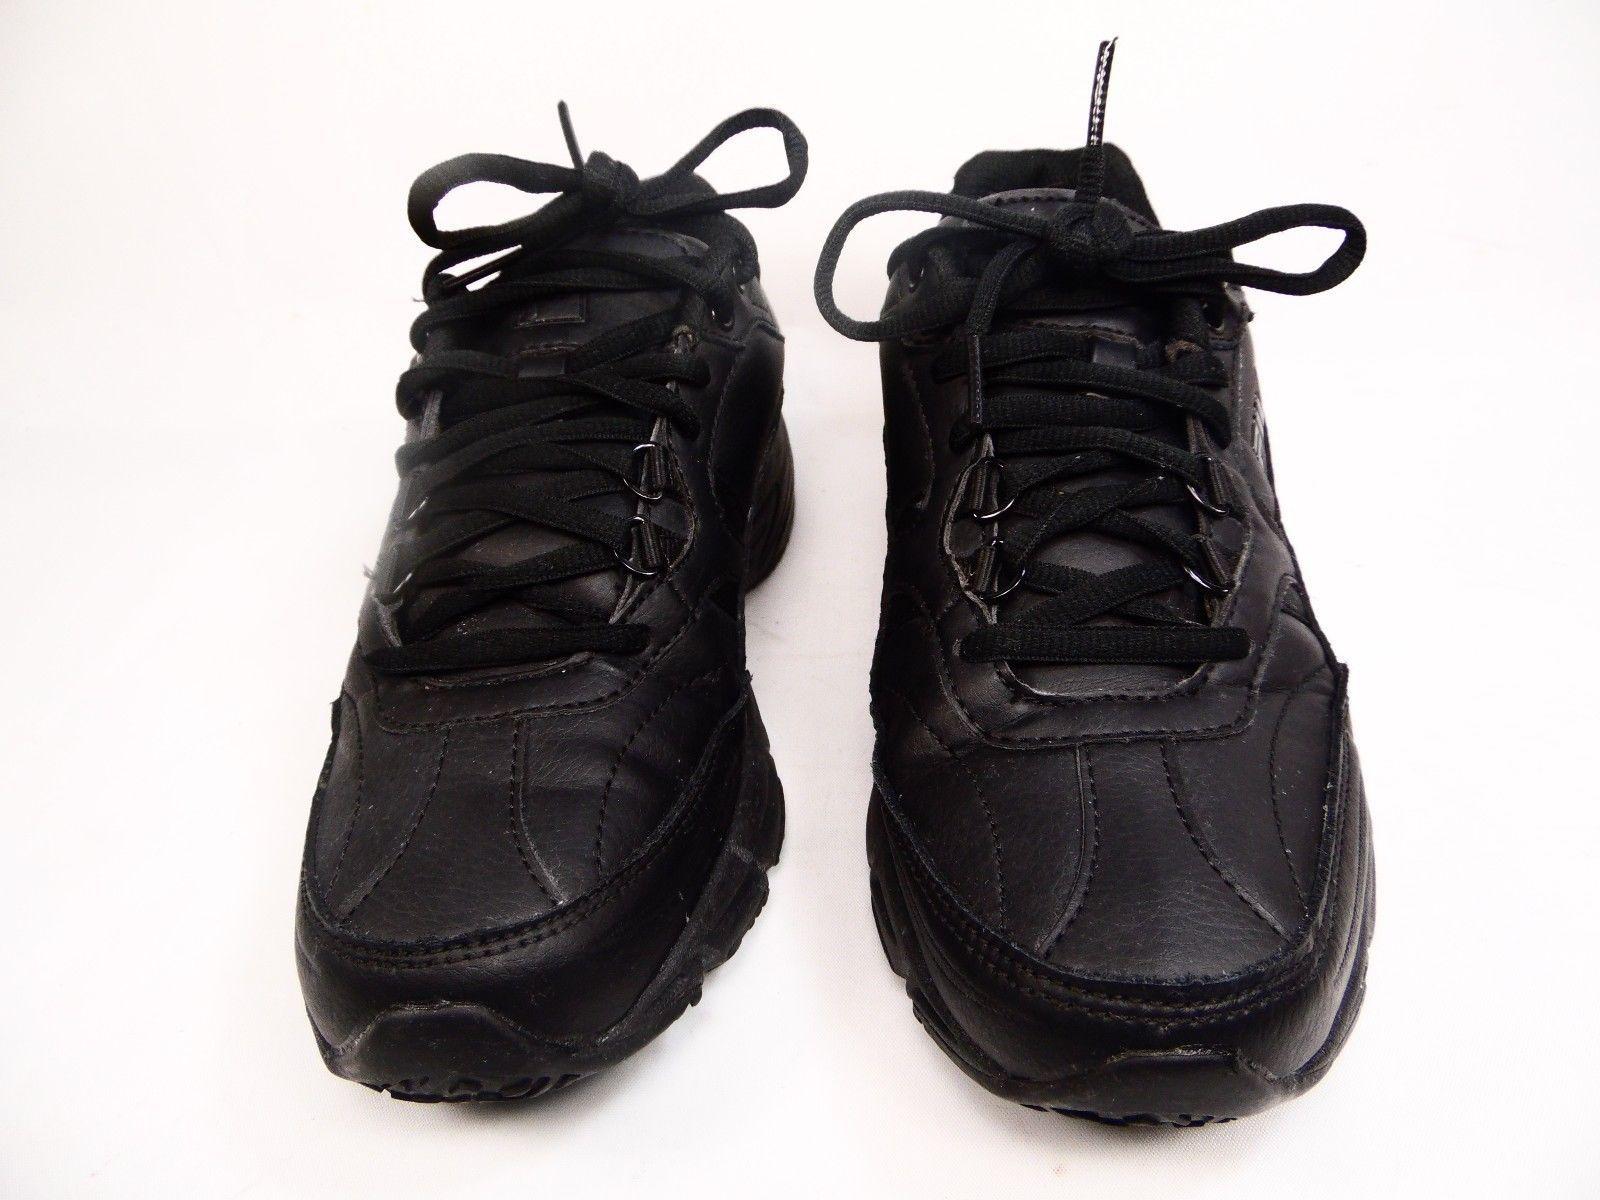 6bacaf5ba504f S l1600. S l1600. Previous. Fila Memory Workshift Womens Slip-Resistant Athletic  Shoes Black ...